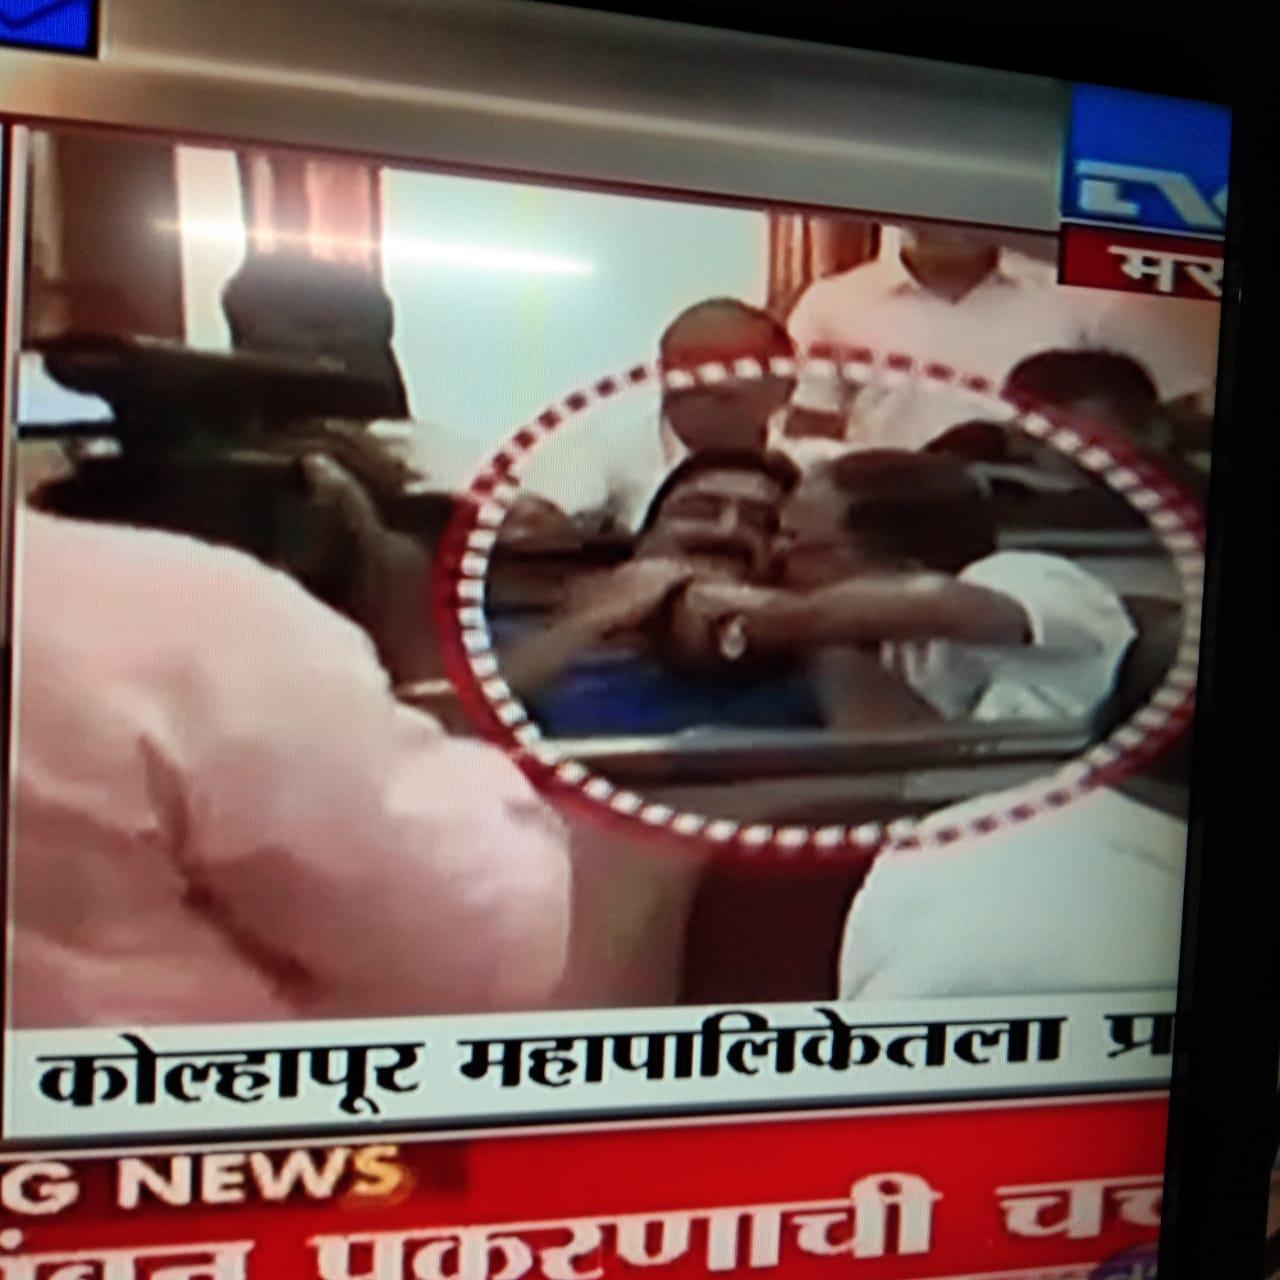 Two Kolhapur corporators caught kissing